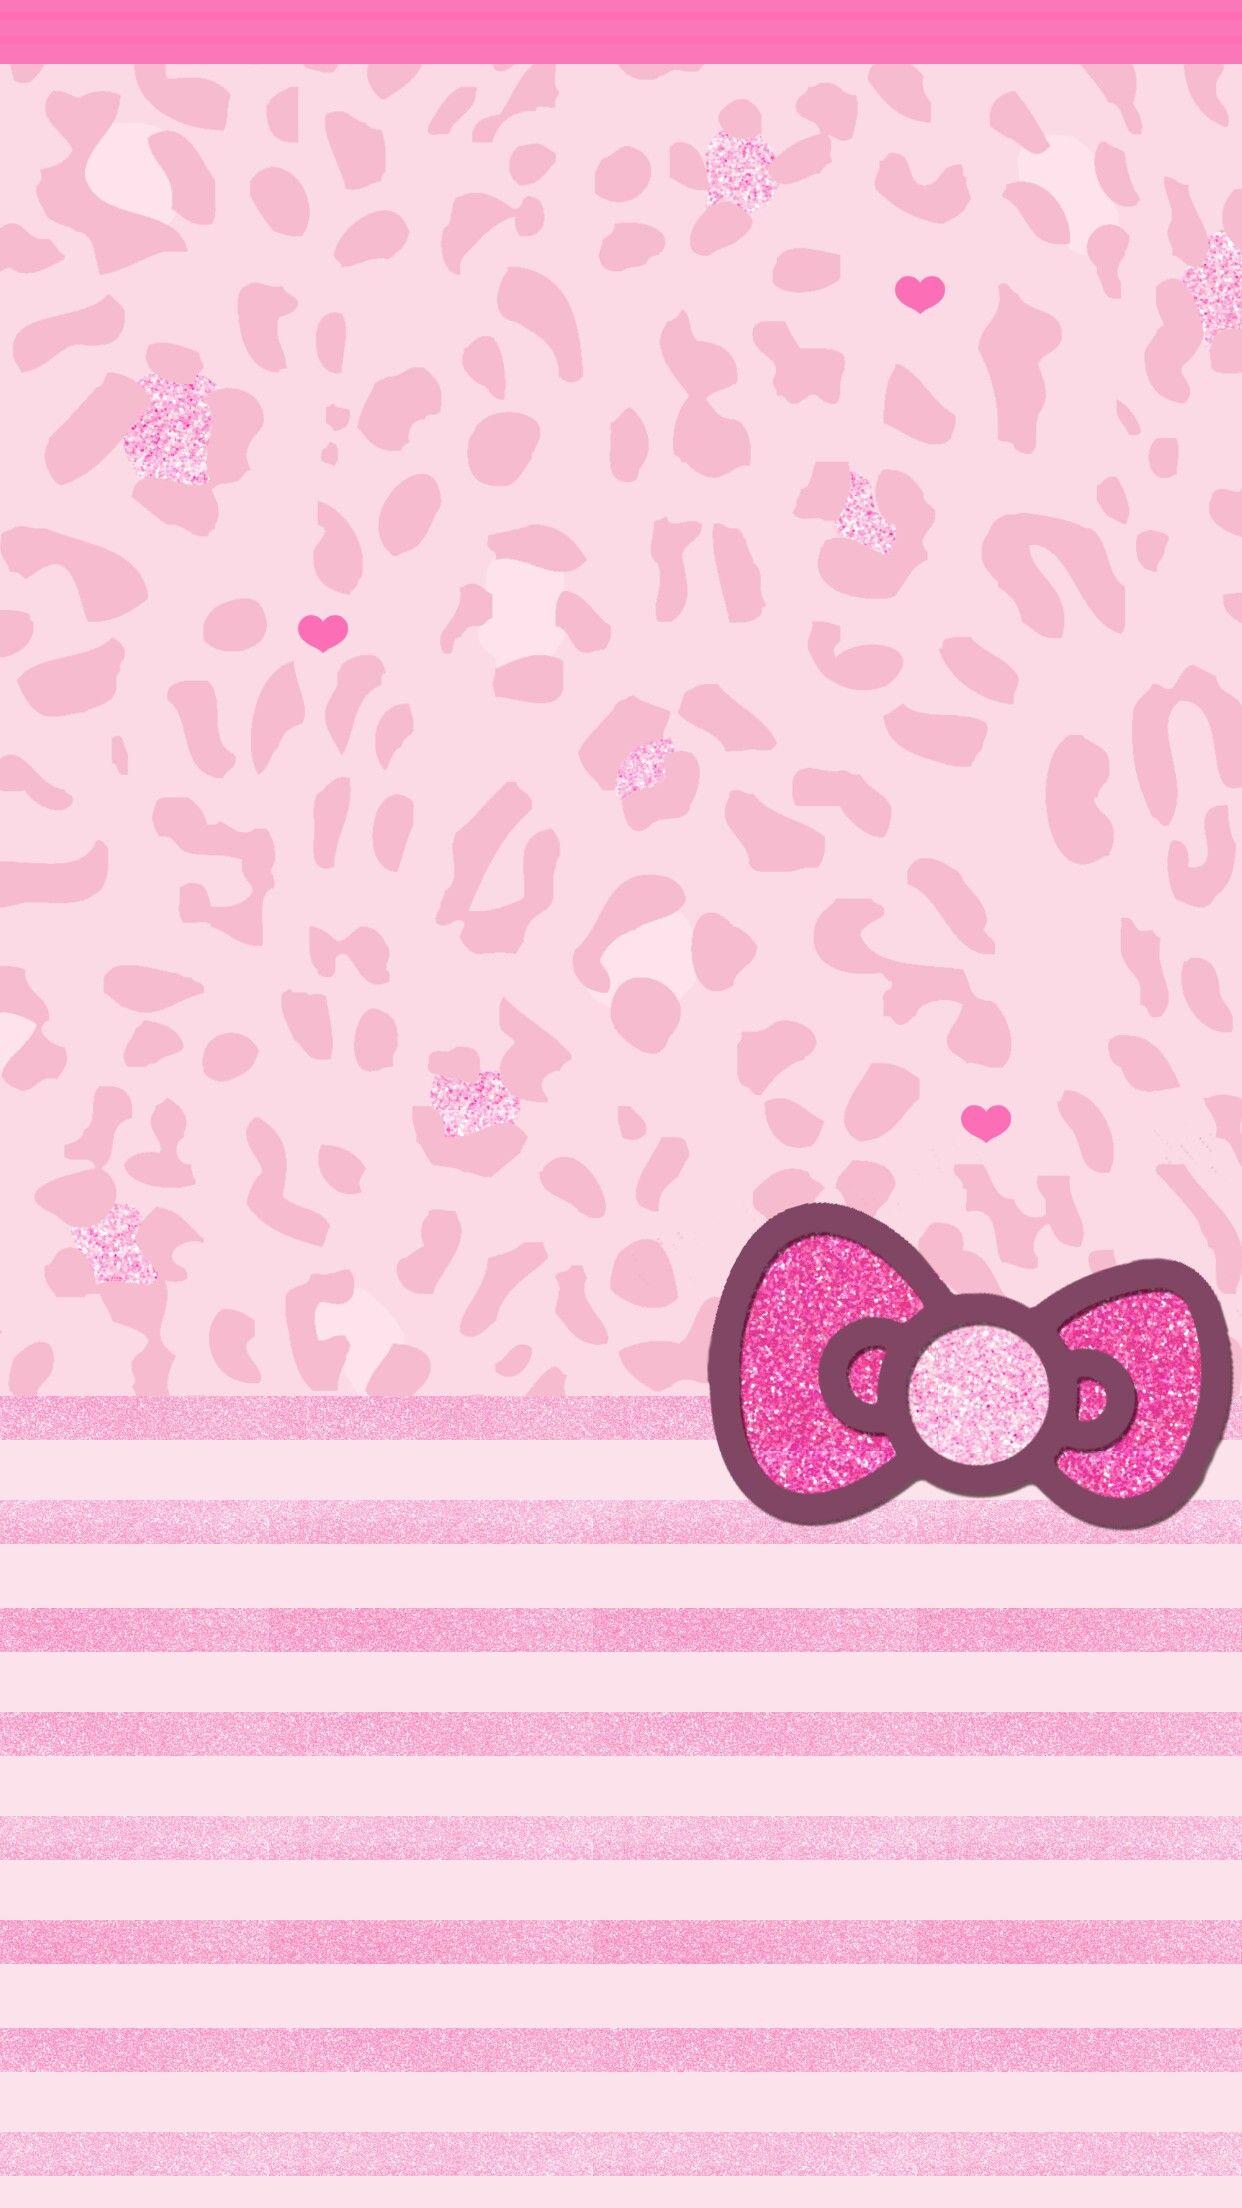 Fantastic Wallpaper Hello Kitty Huawei - d3c58e9cf48d2a7f5e1066cdd60d5c86  Collection_68125.jpg